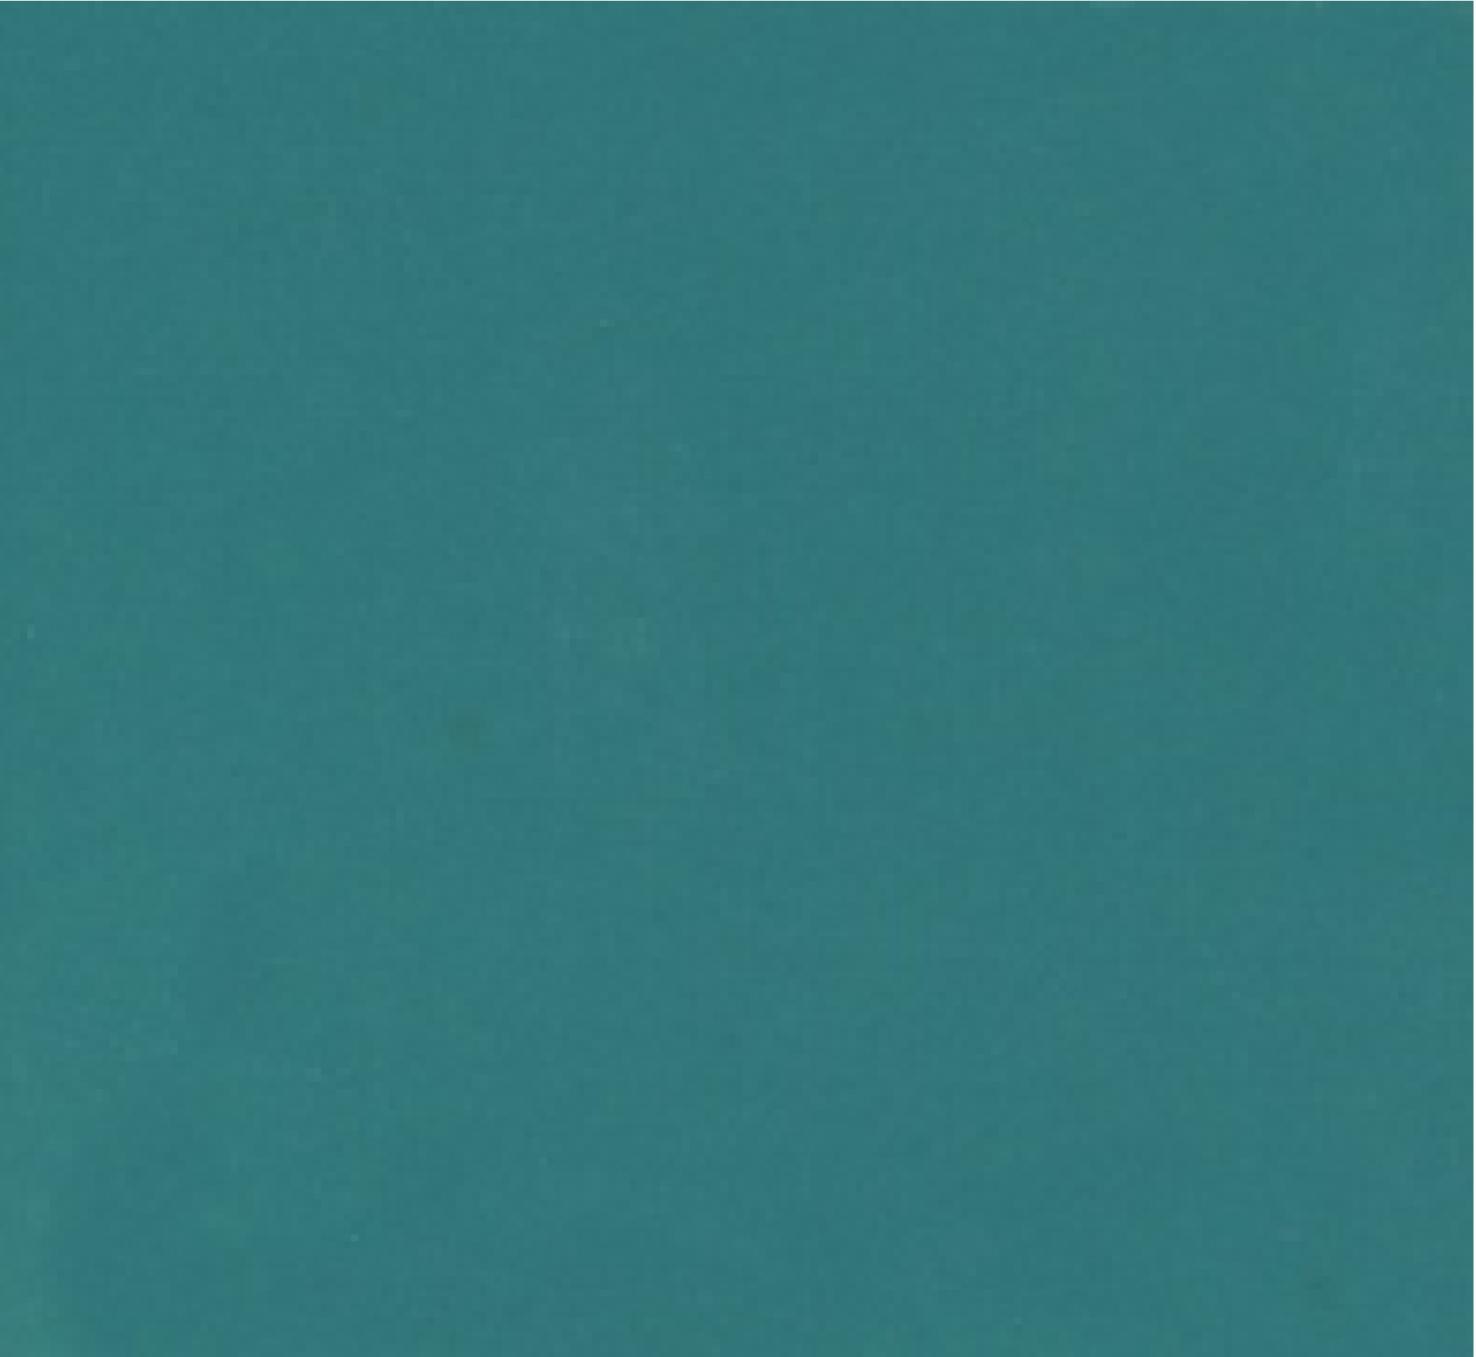 Simplicity Jade 671